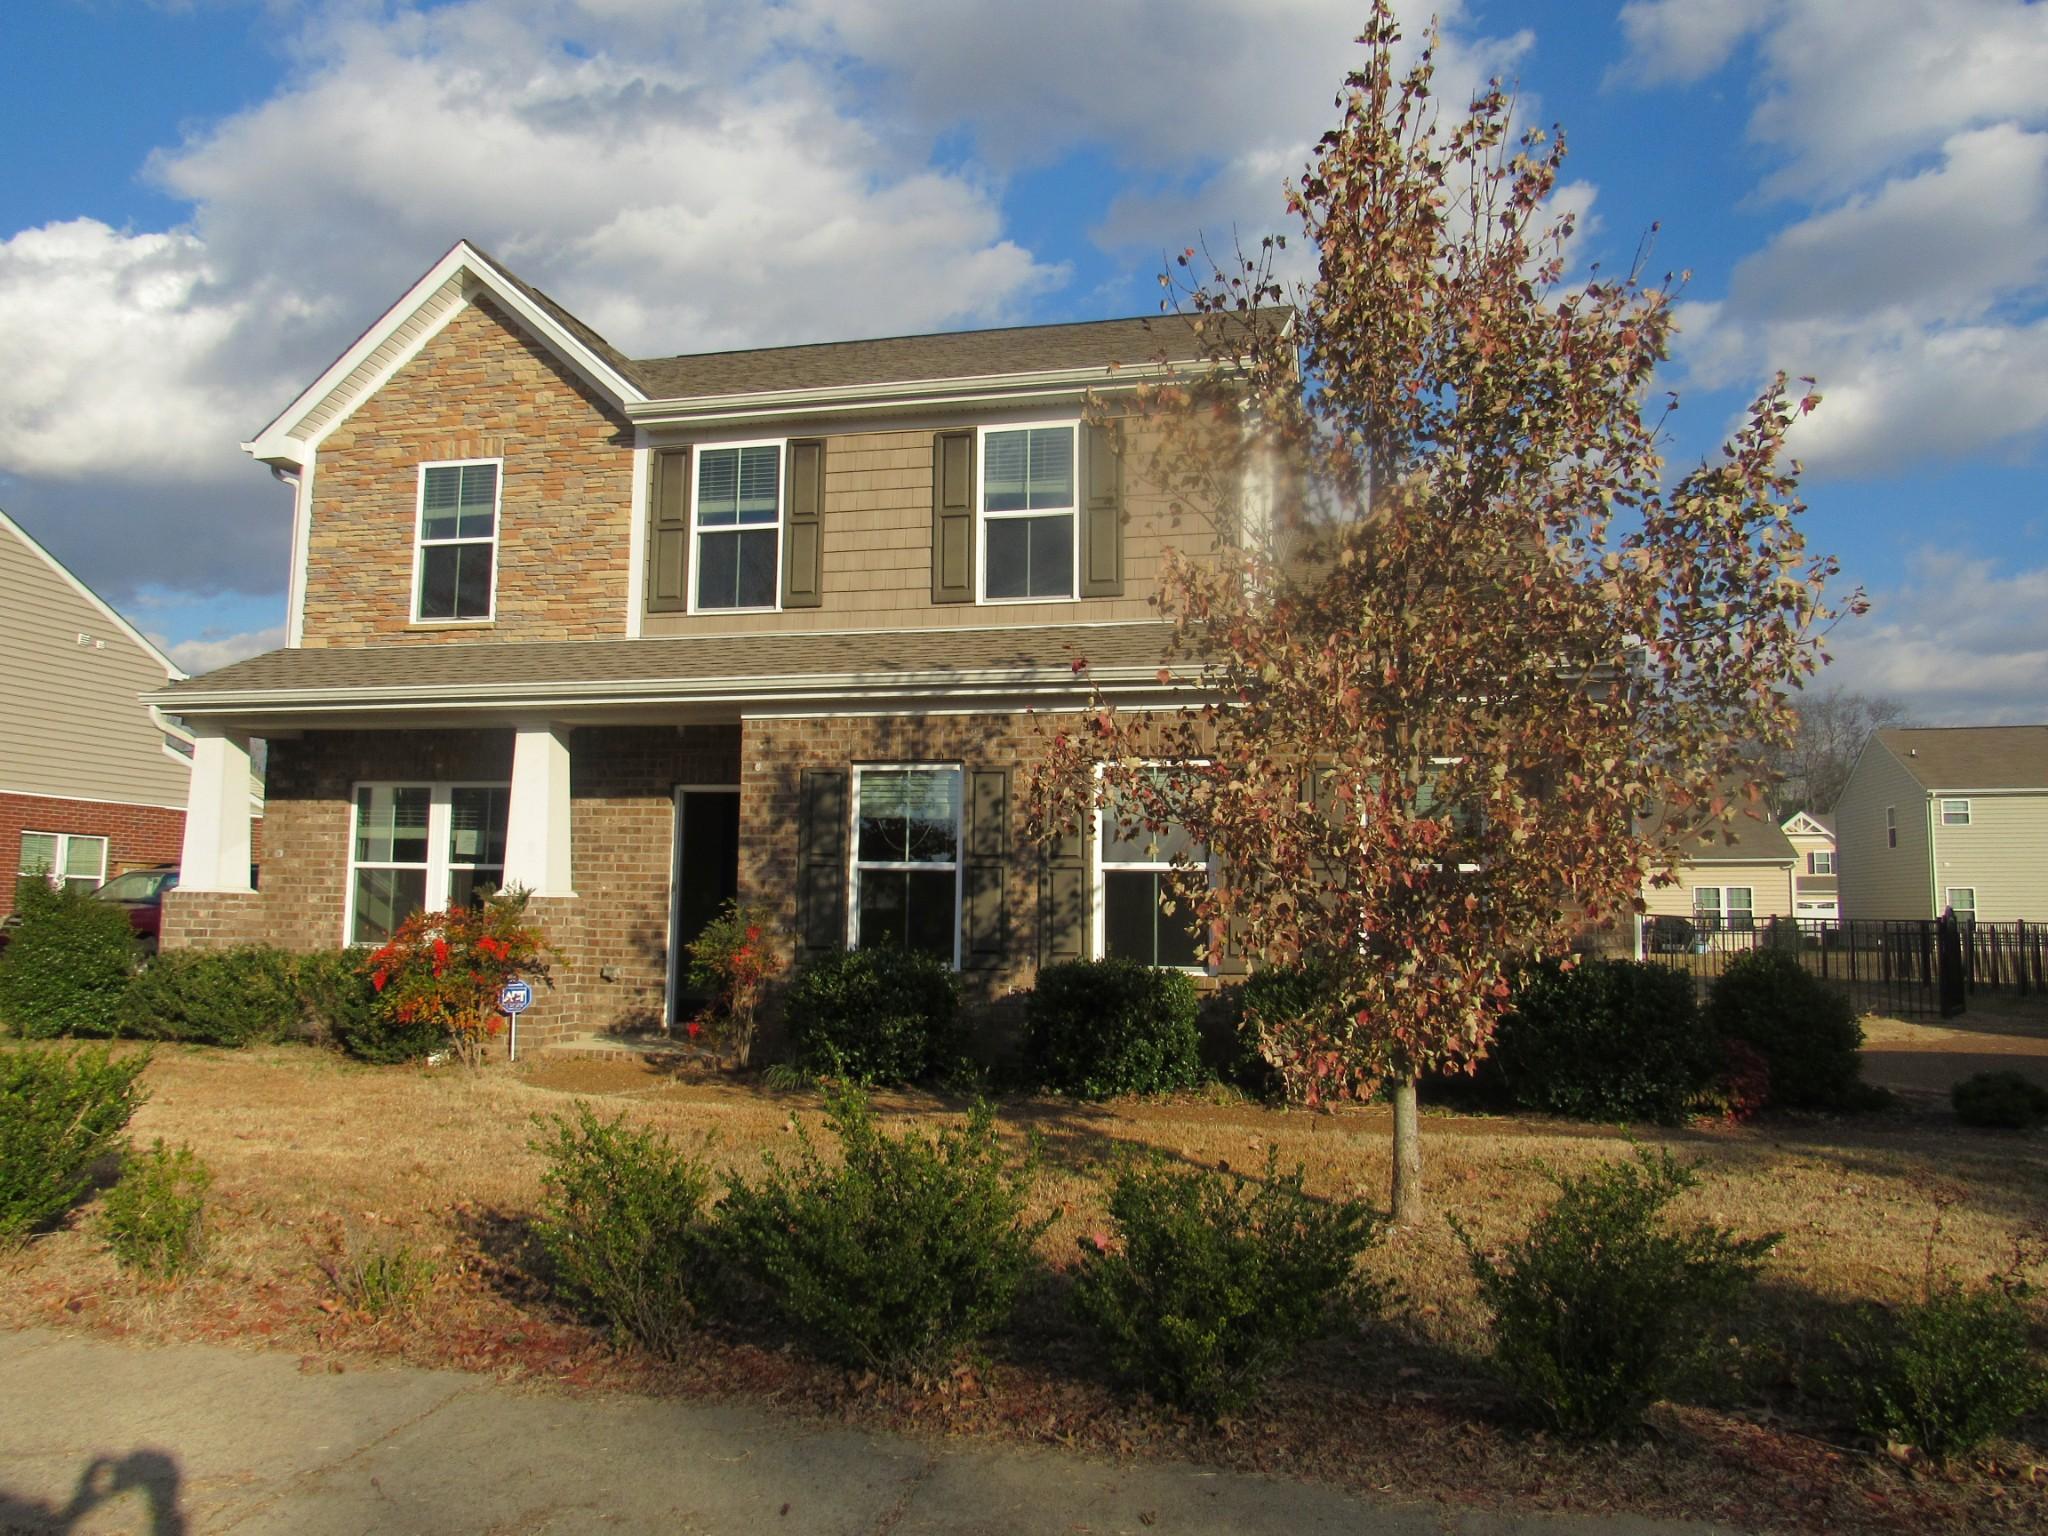 3019 Weston Blvd, Murfreesboro, TN 37128 - Murfreesboro, TN real estate listing